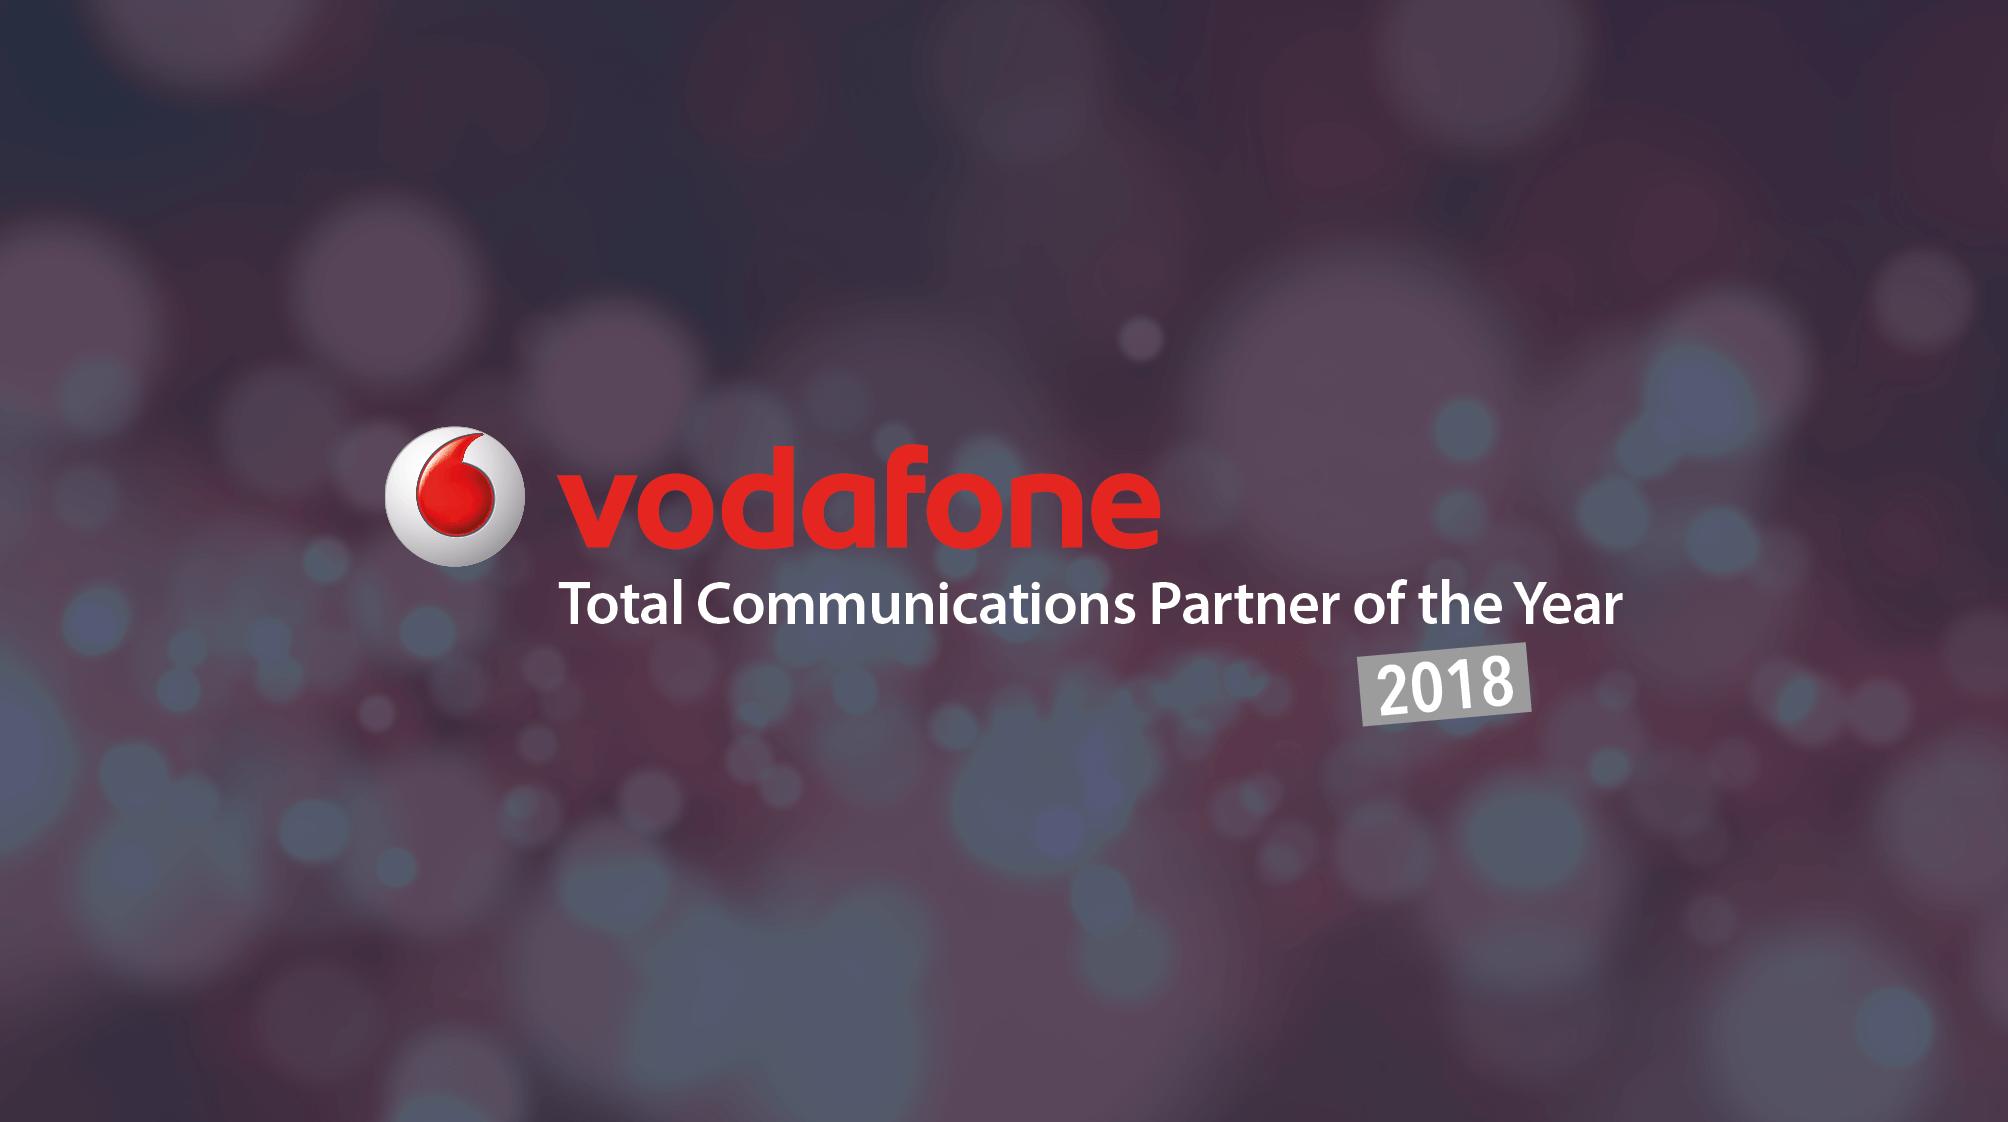 Onecom Wins Total Communications Partner Award at Vodafone Partner of the Year Awards 2018-2019